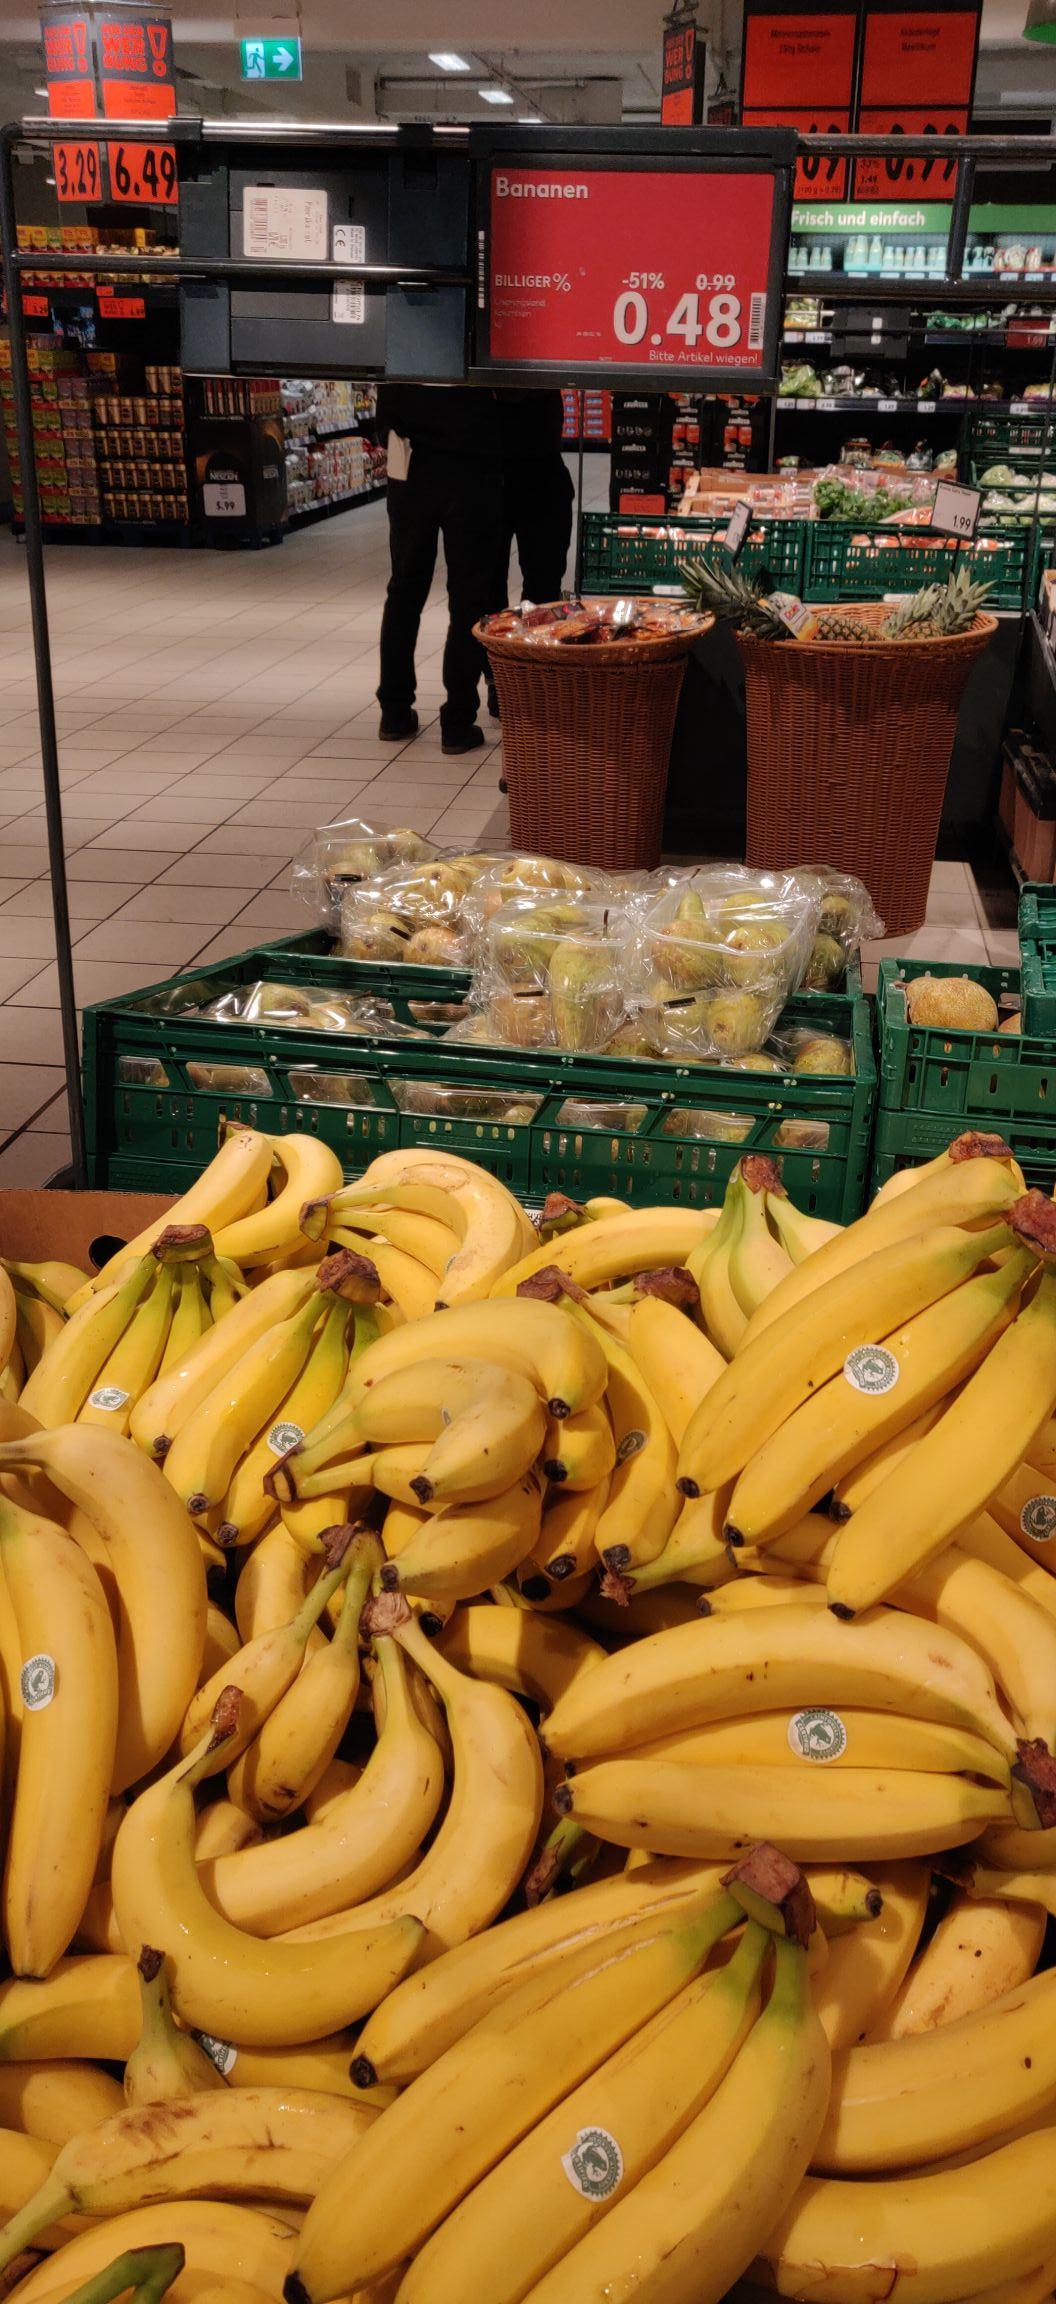 Bananen -51% [lokal - Kaufland HN - Stgt. Str]